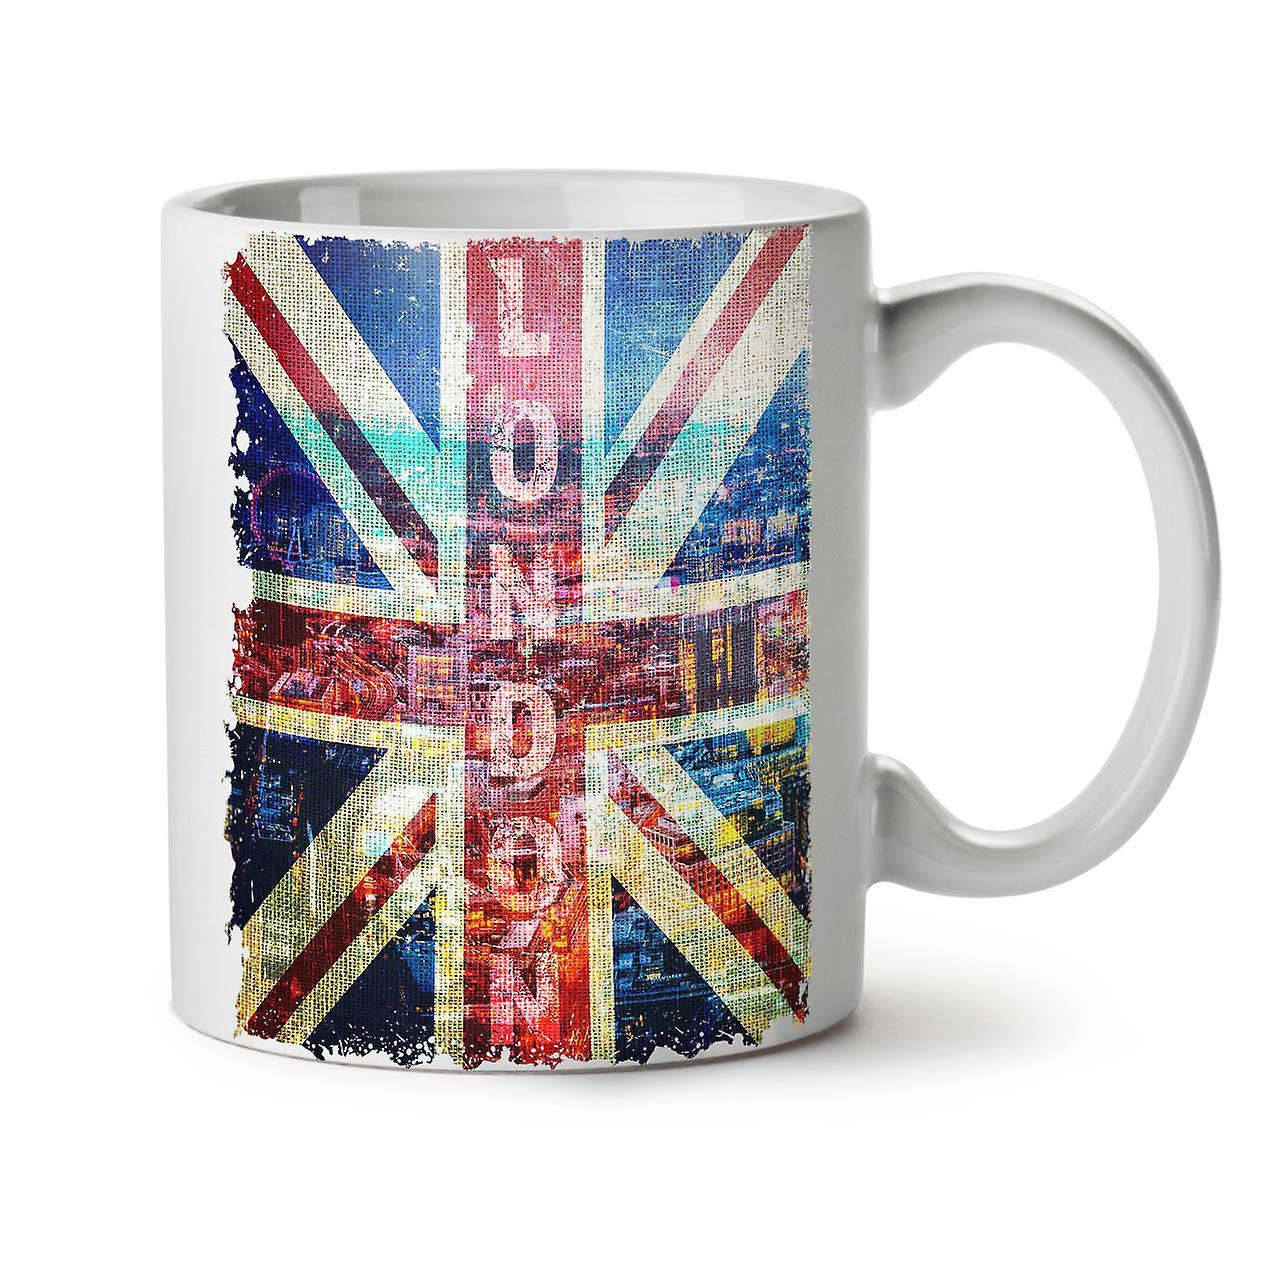 Blanc Londres Céramique OzWellcoda 11 Angleterre Nouveau Tasse Art Thé Café w8vNnOm0